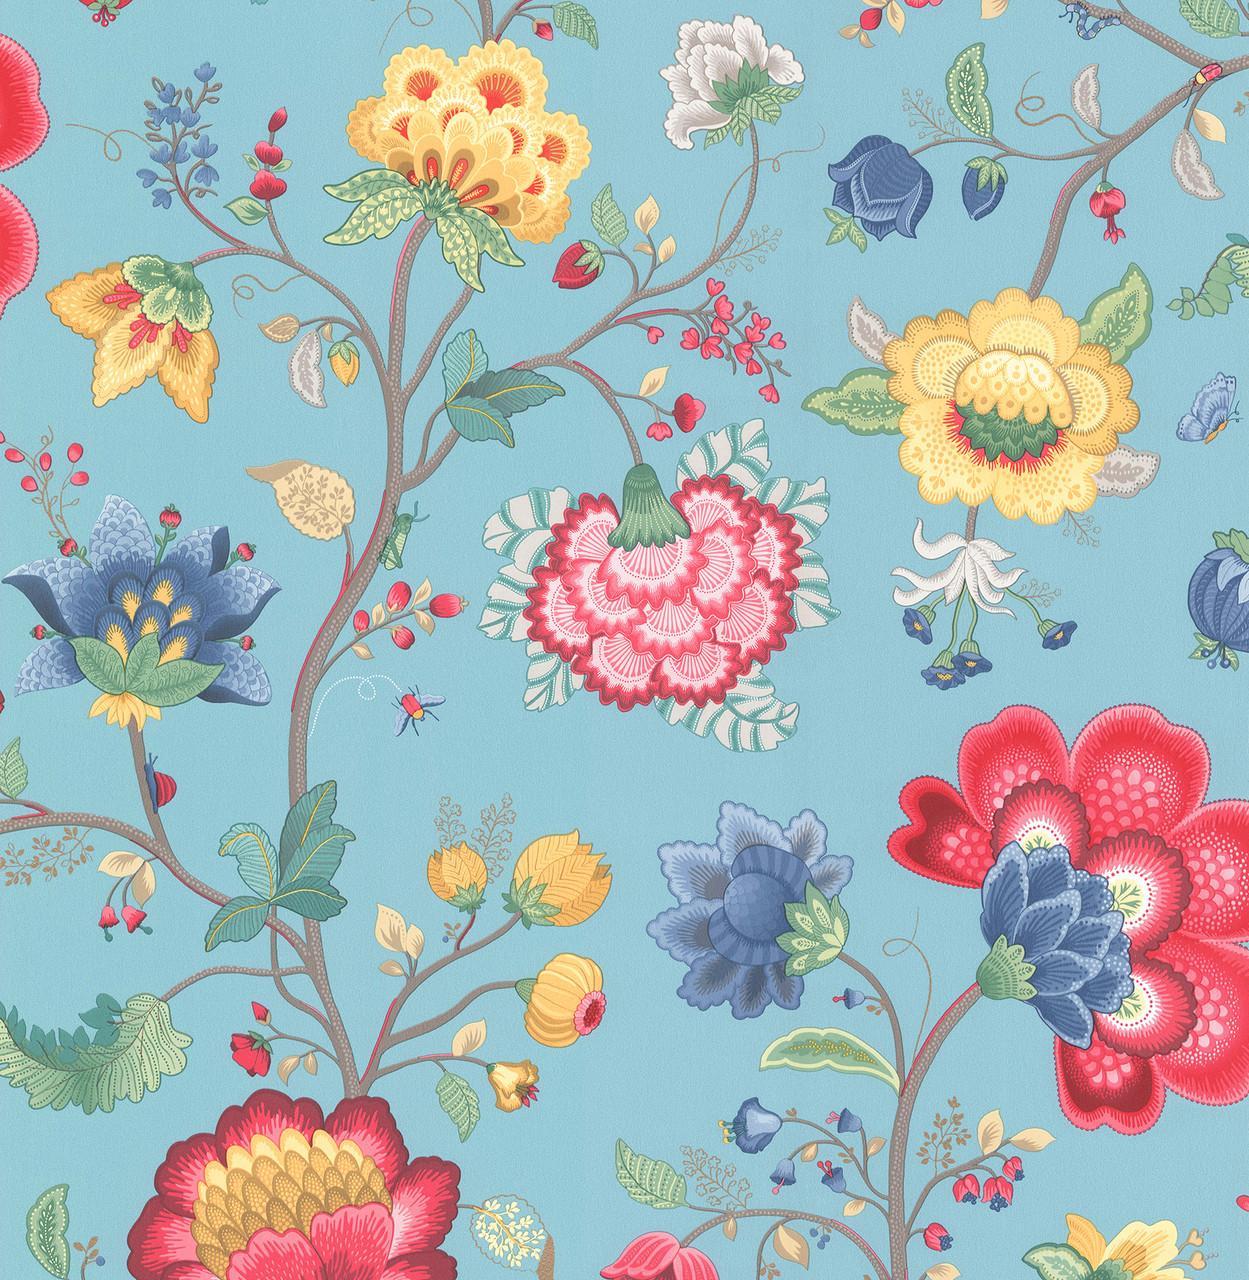 Epona Light Blue Floral Fantasy 341035 Wallpaper Indoorwallpaper Com